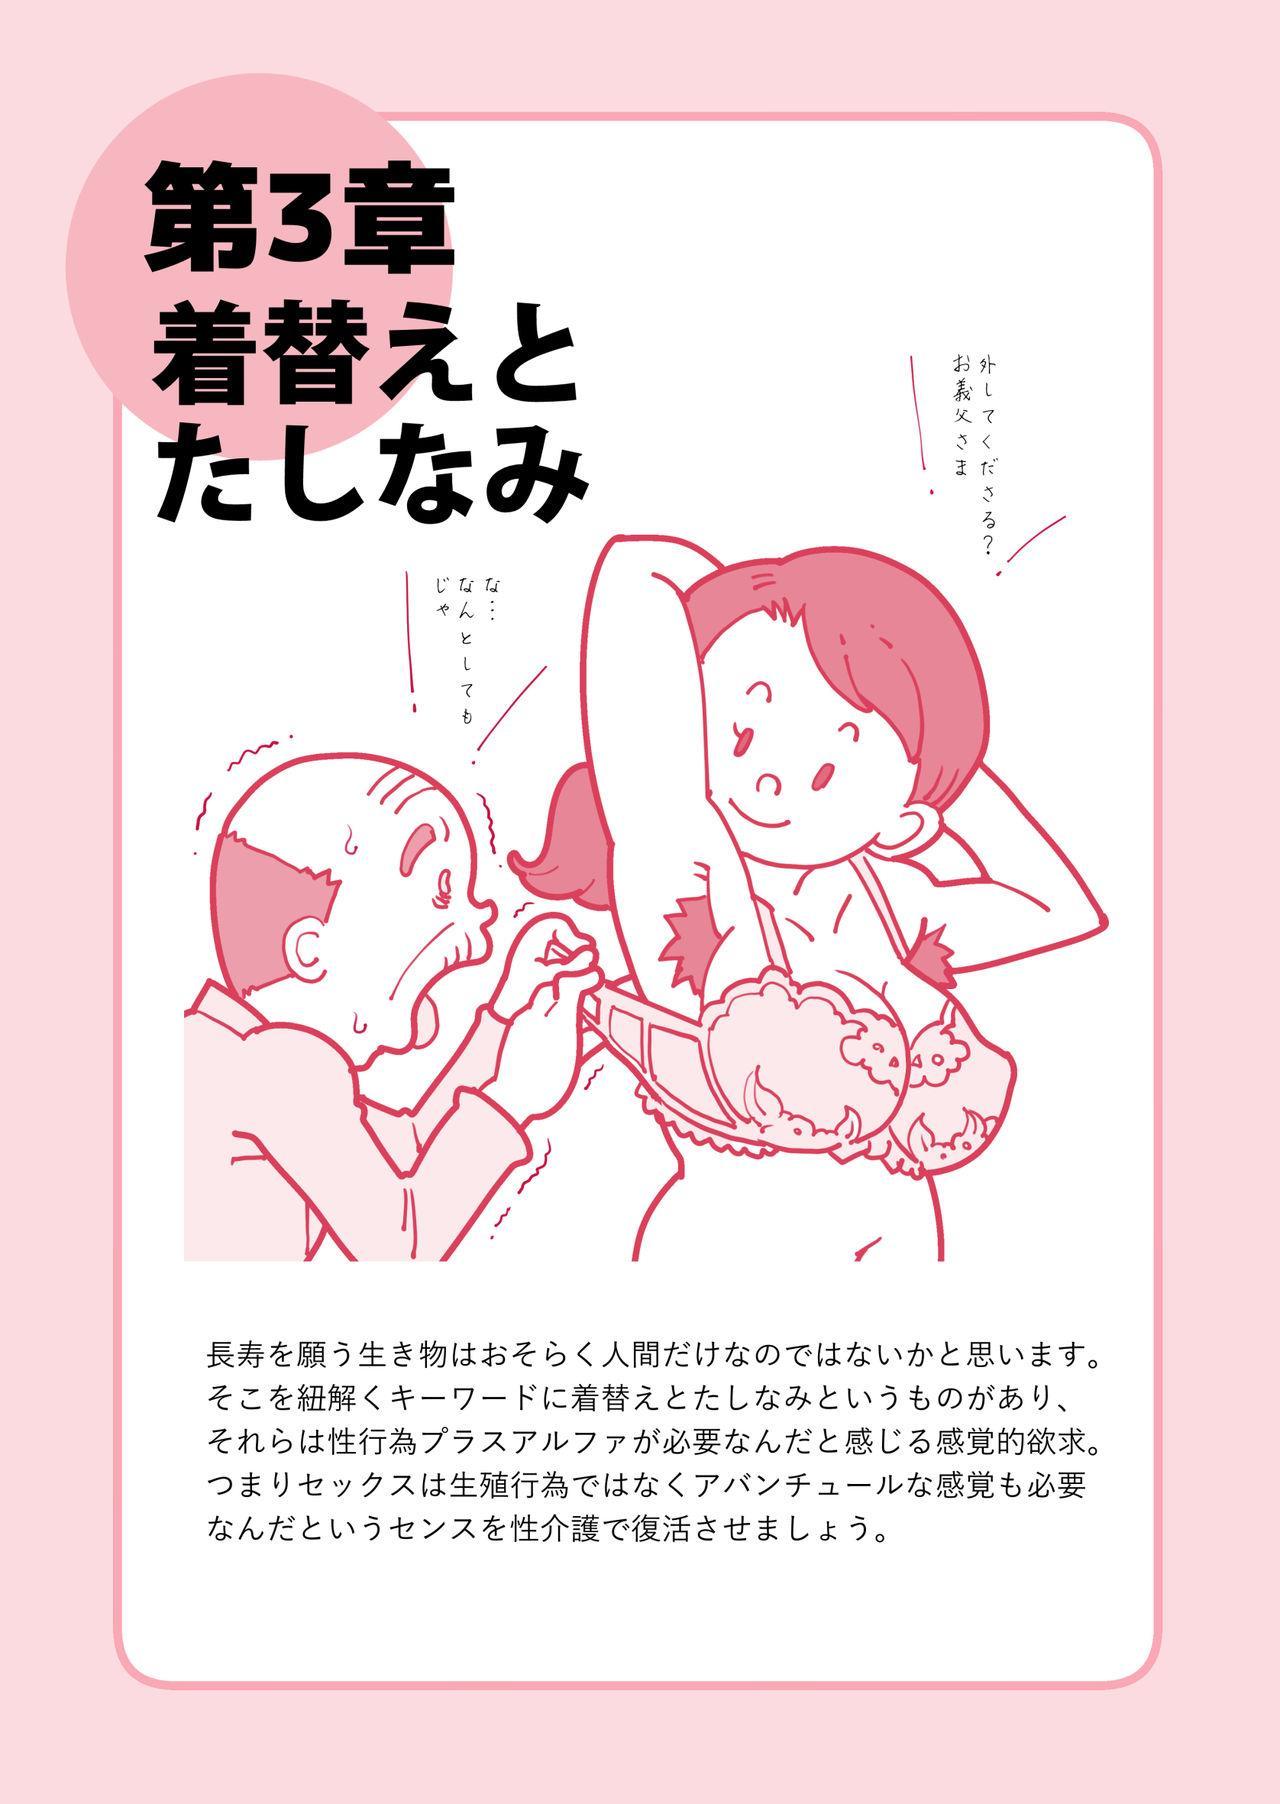 Isogasii Okaasan No Tamuno Sasa Rouzin Seikaigo | Guide for Elderly Sex Health Care to Busy Mom 24